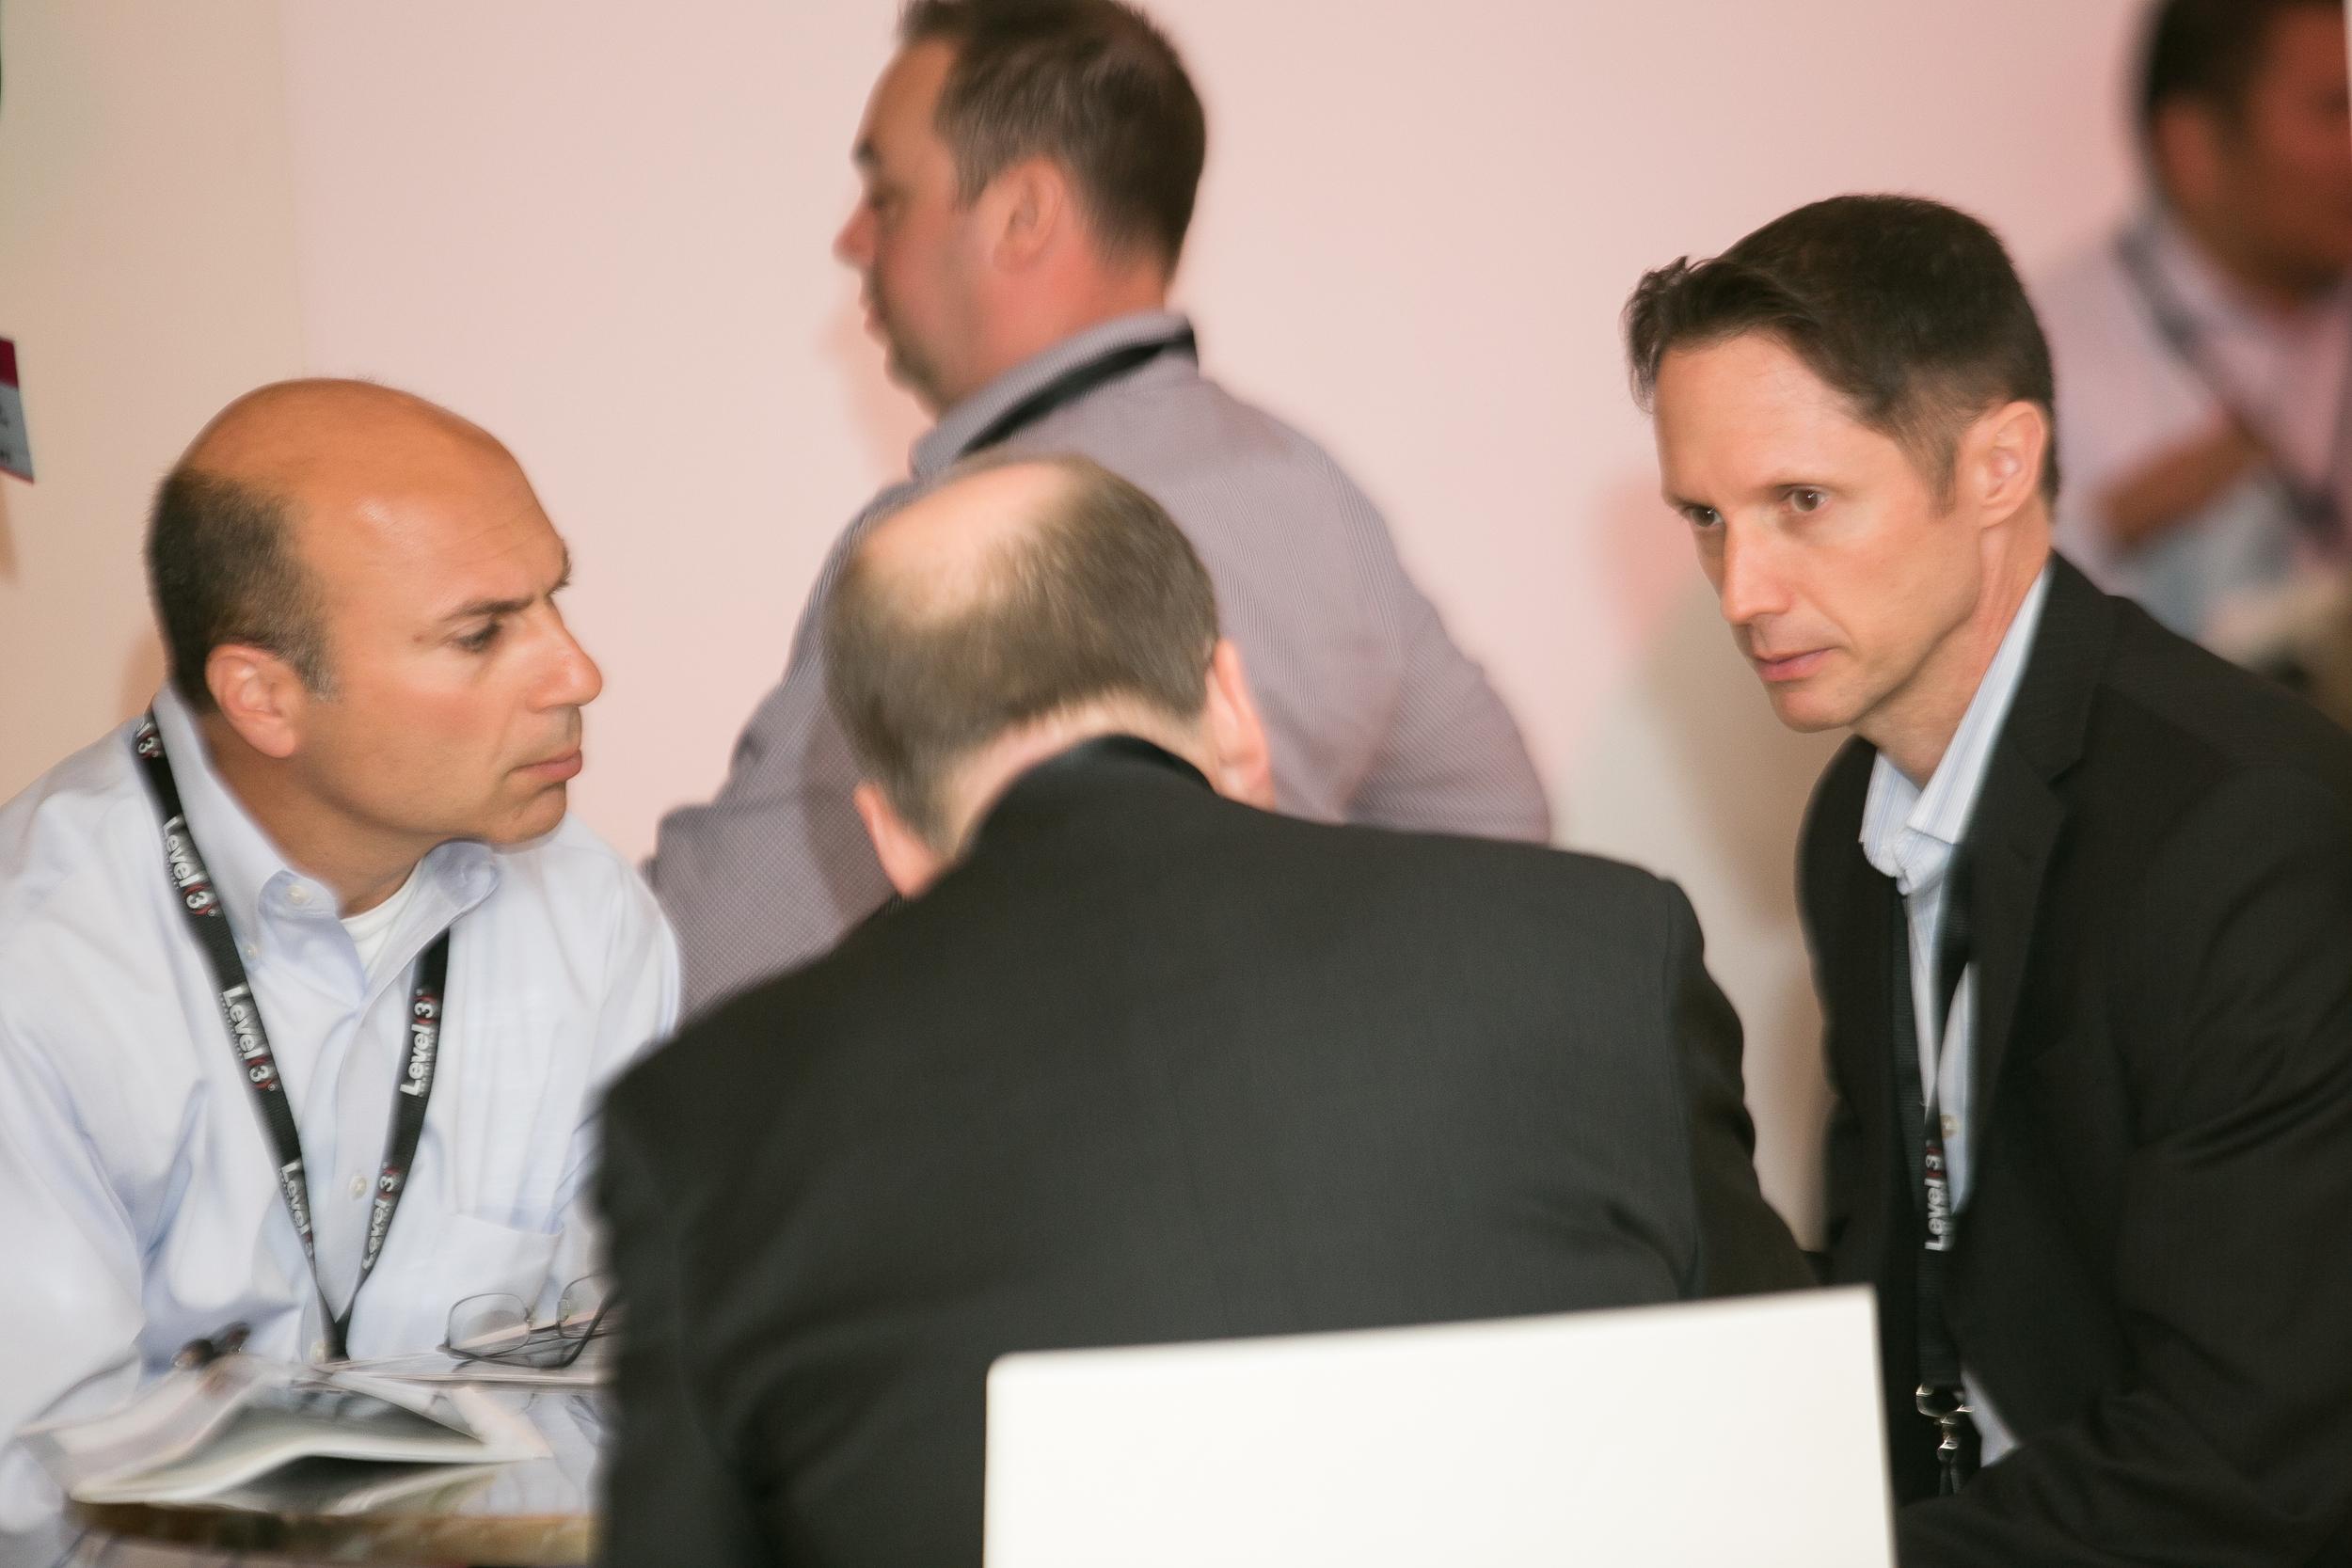 020-Capacity_Conferences-WAN_Summit-042715-6P9A9998.jpg